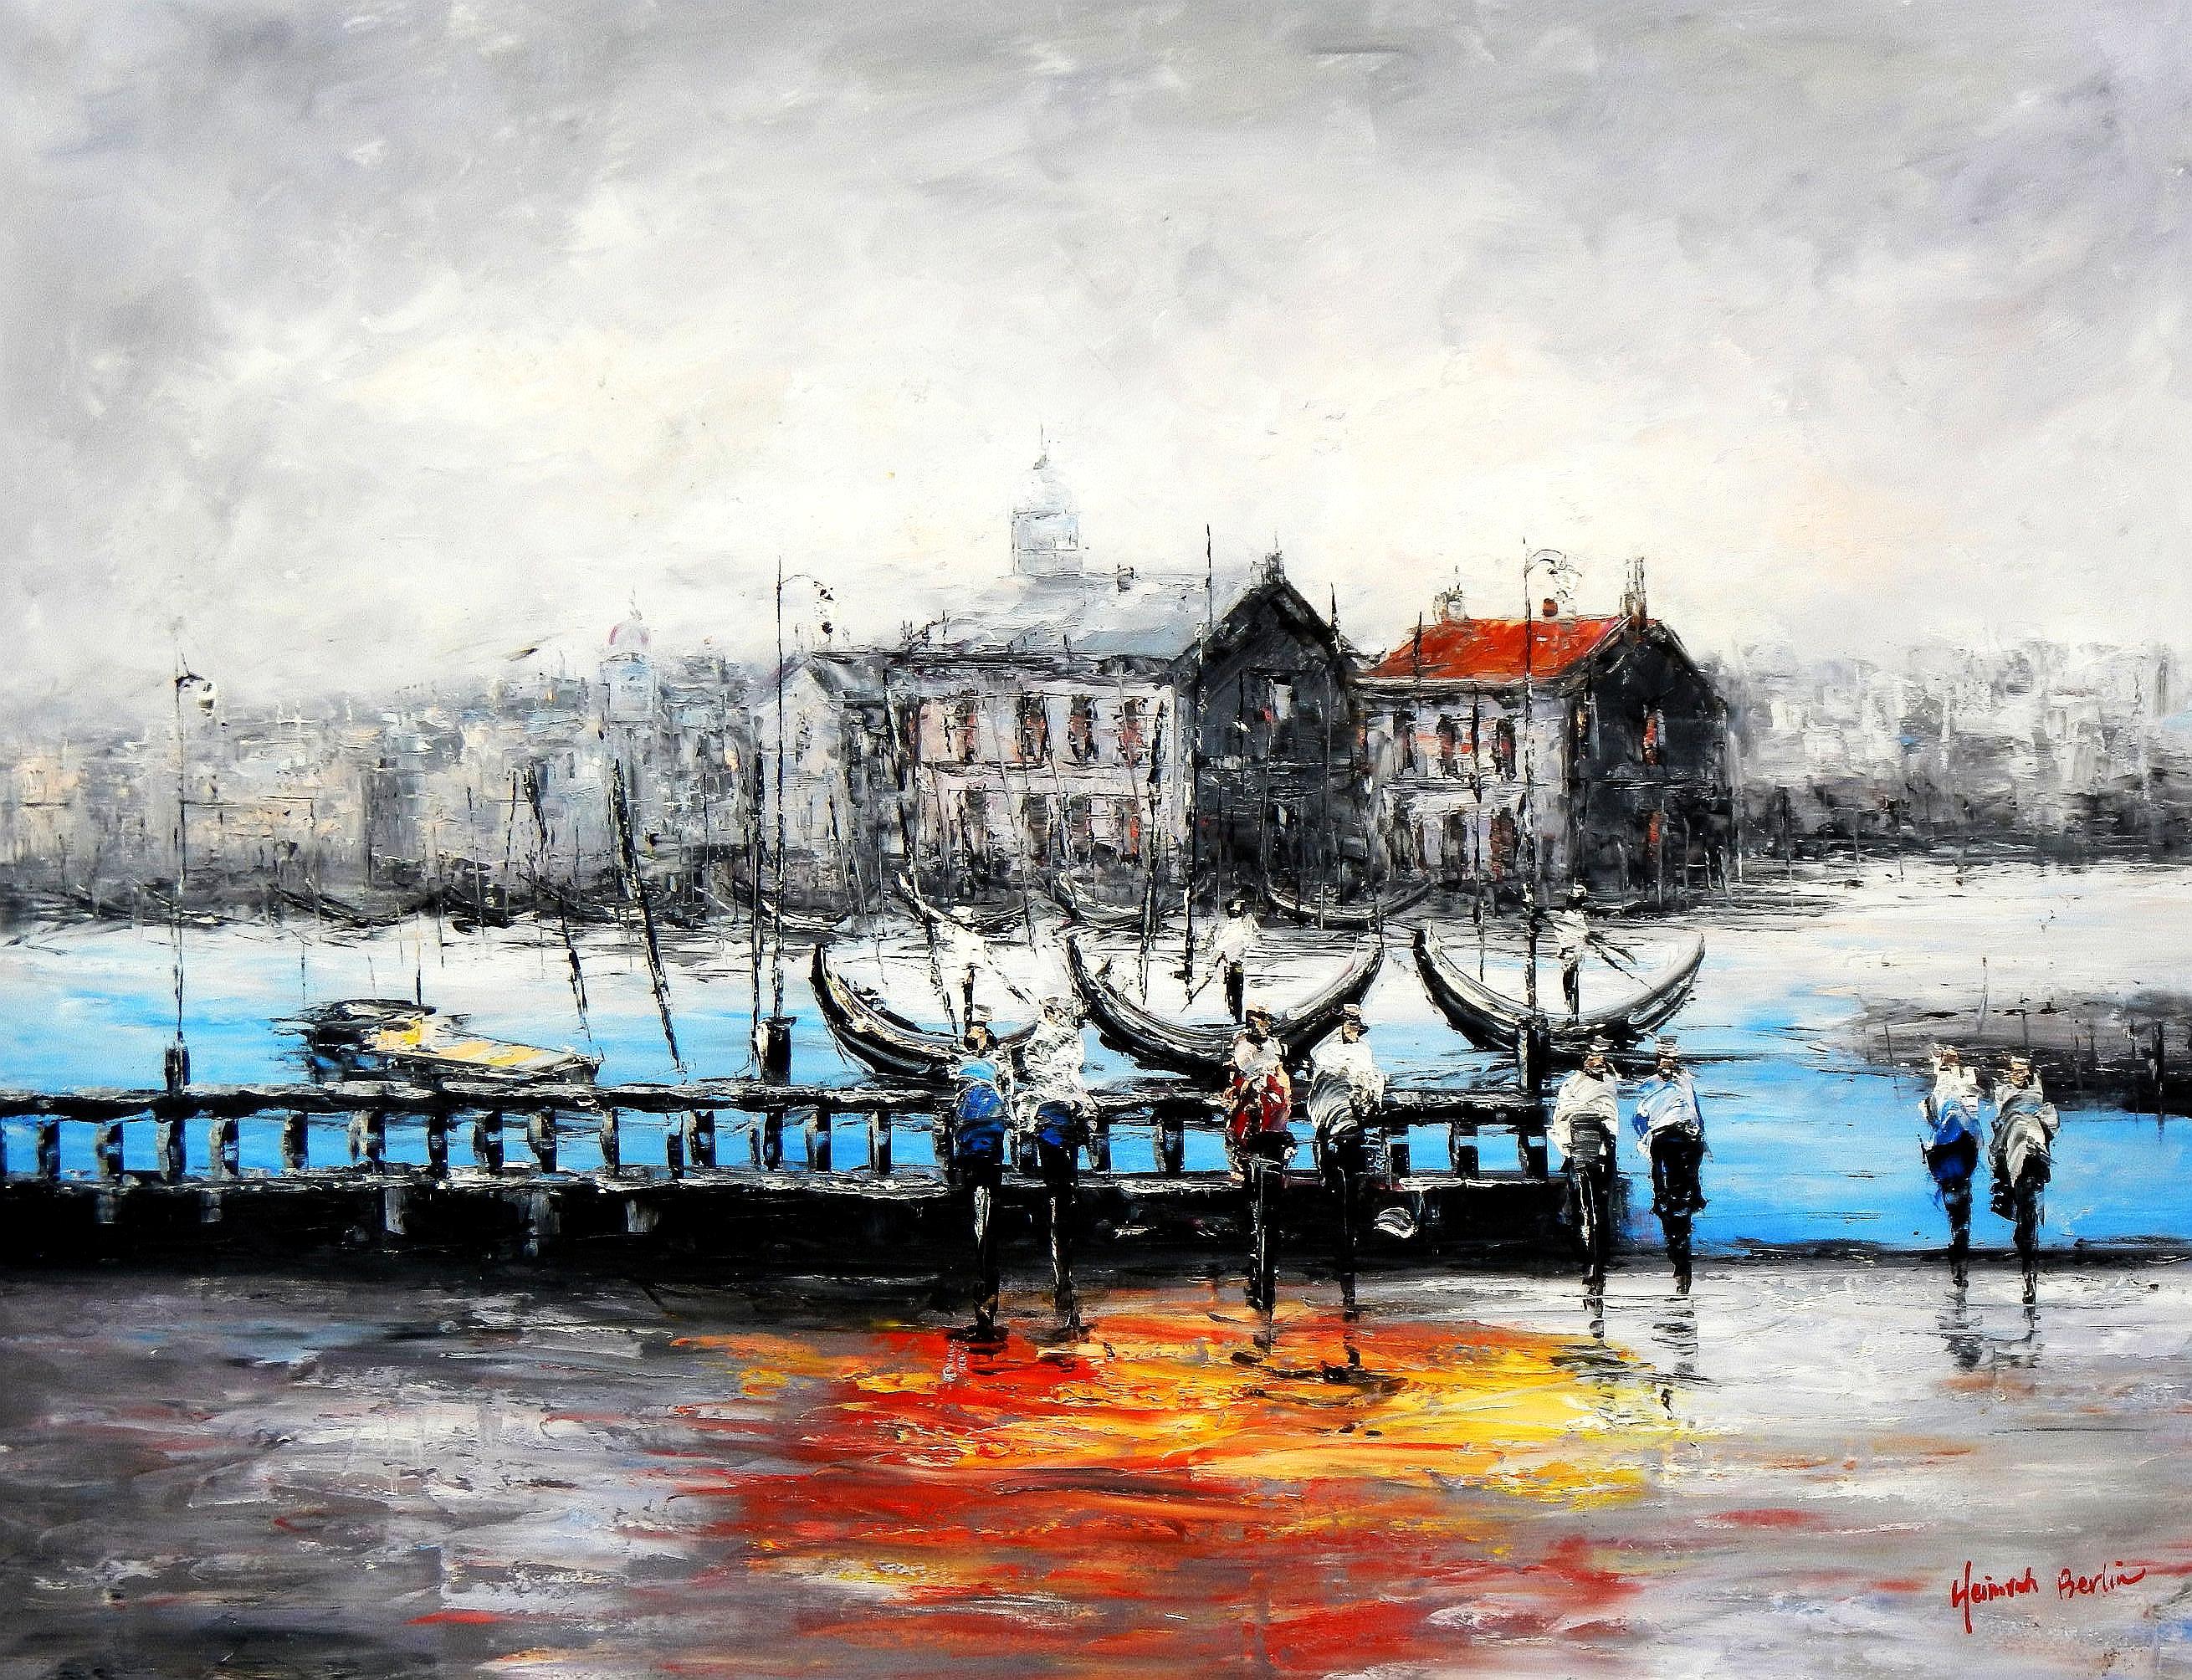 Modern Art - Venedig im Morgengrauen k94450 90x120cm bemerkenswertes Ölbild